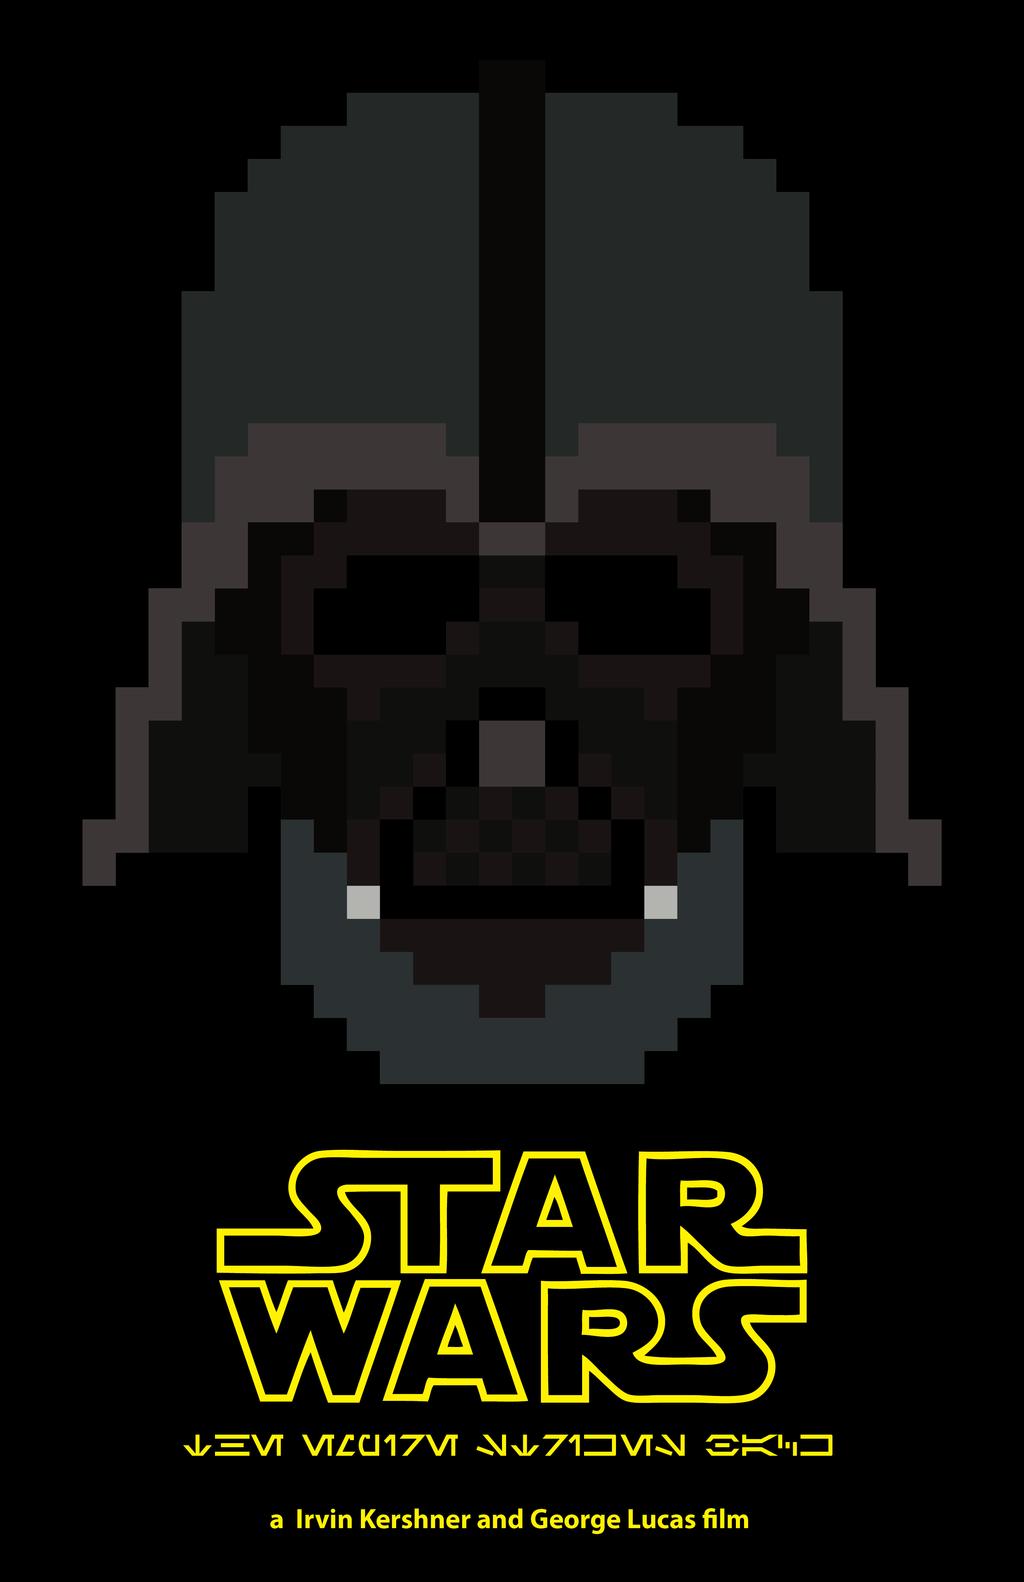 8 Bit Star Wars The Empire Strikes Back Poster Star Wars Empire Strike Movie Poster Project